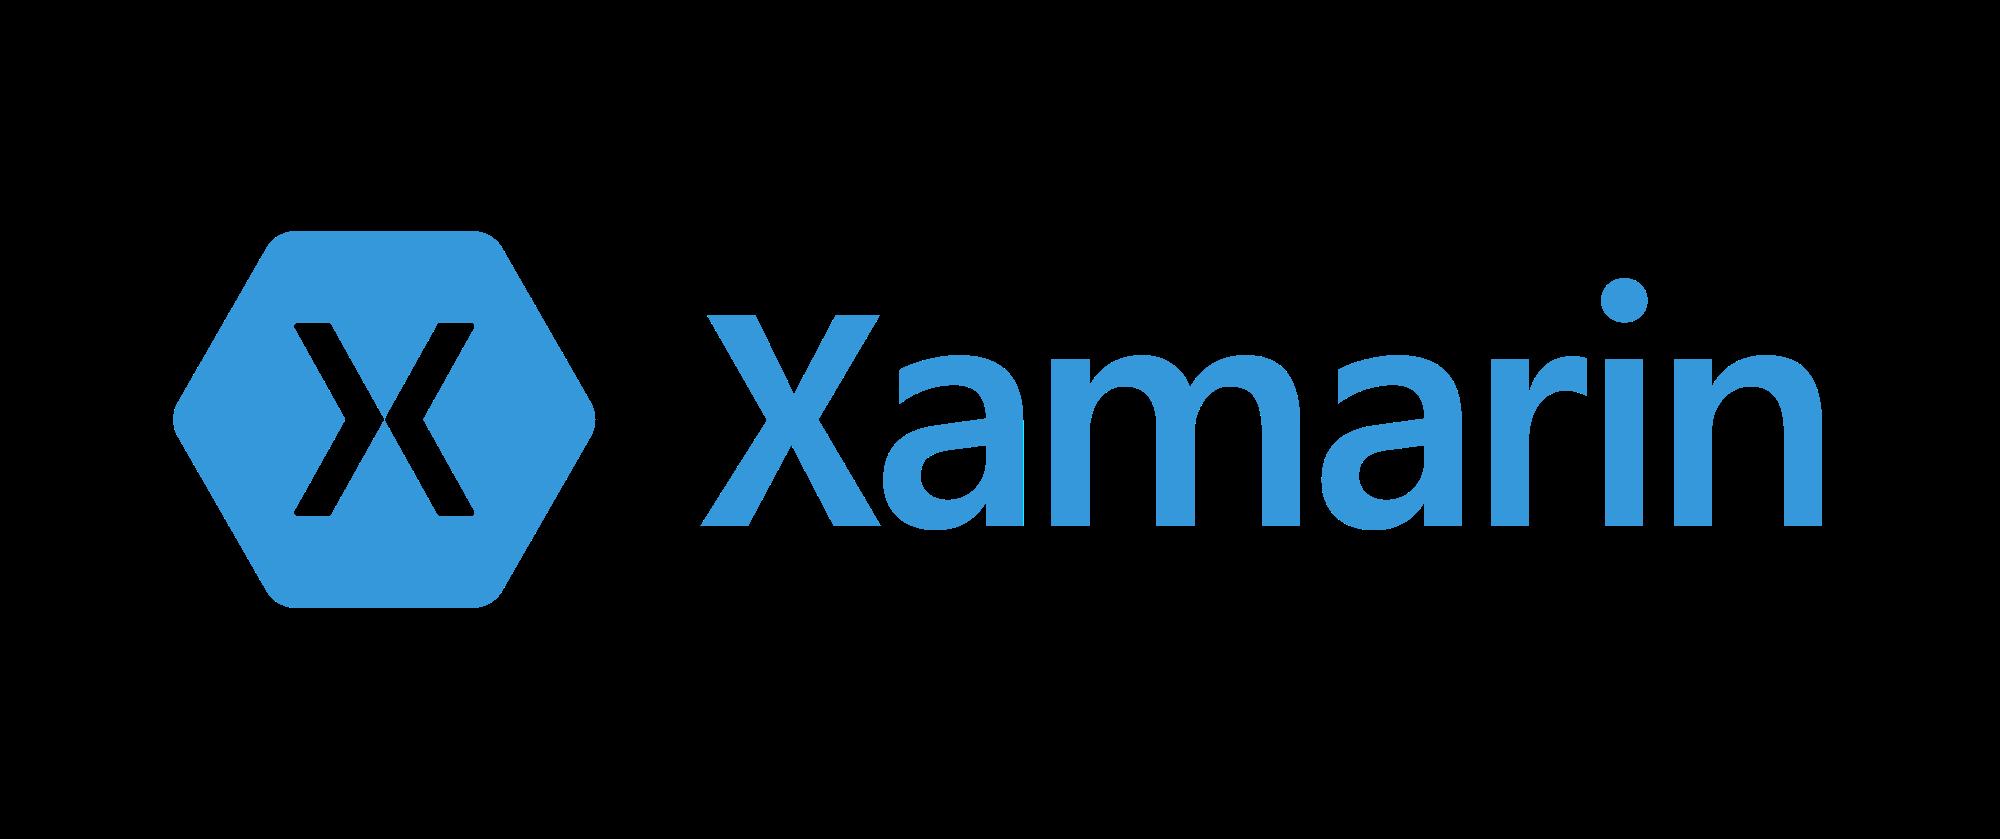 Xamarin App Development Services Provider Company USA India APAC